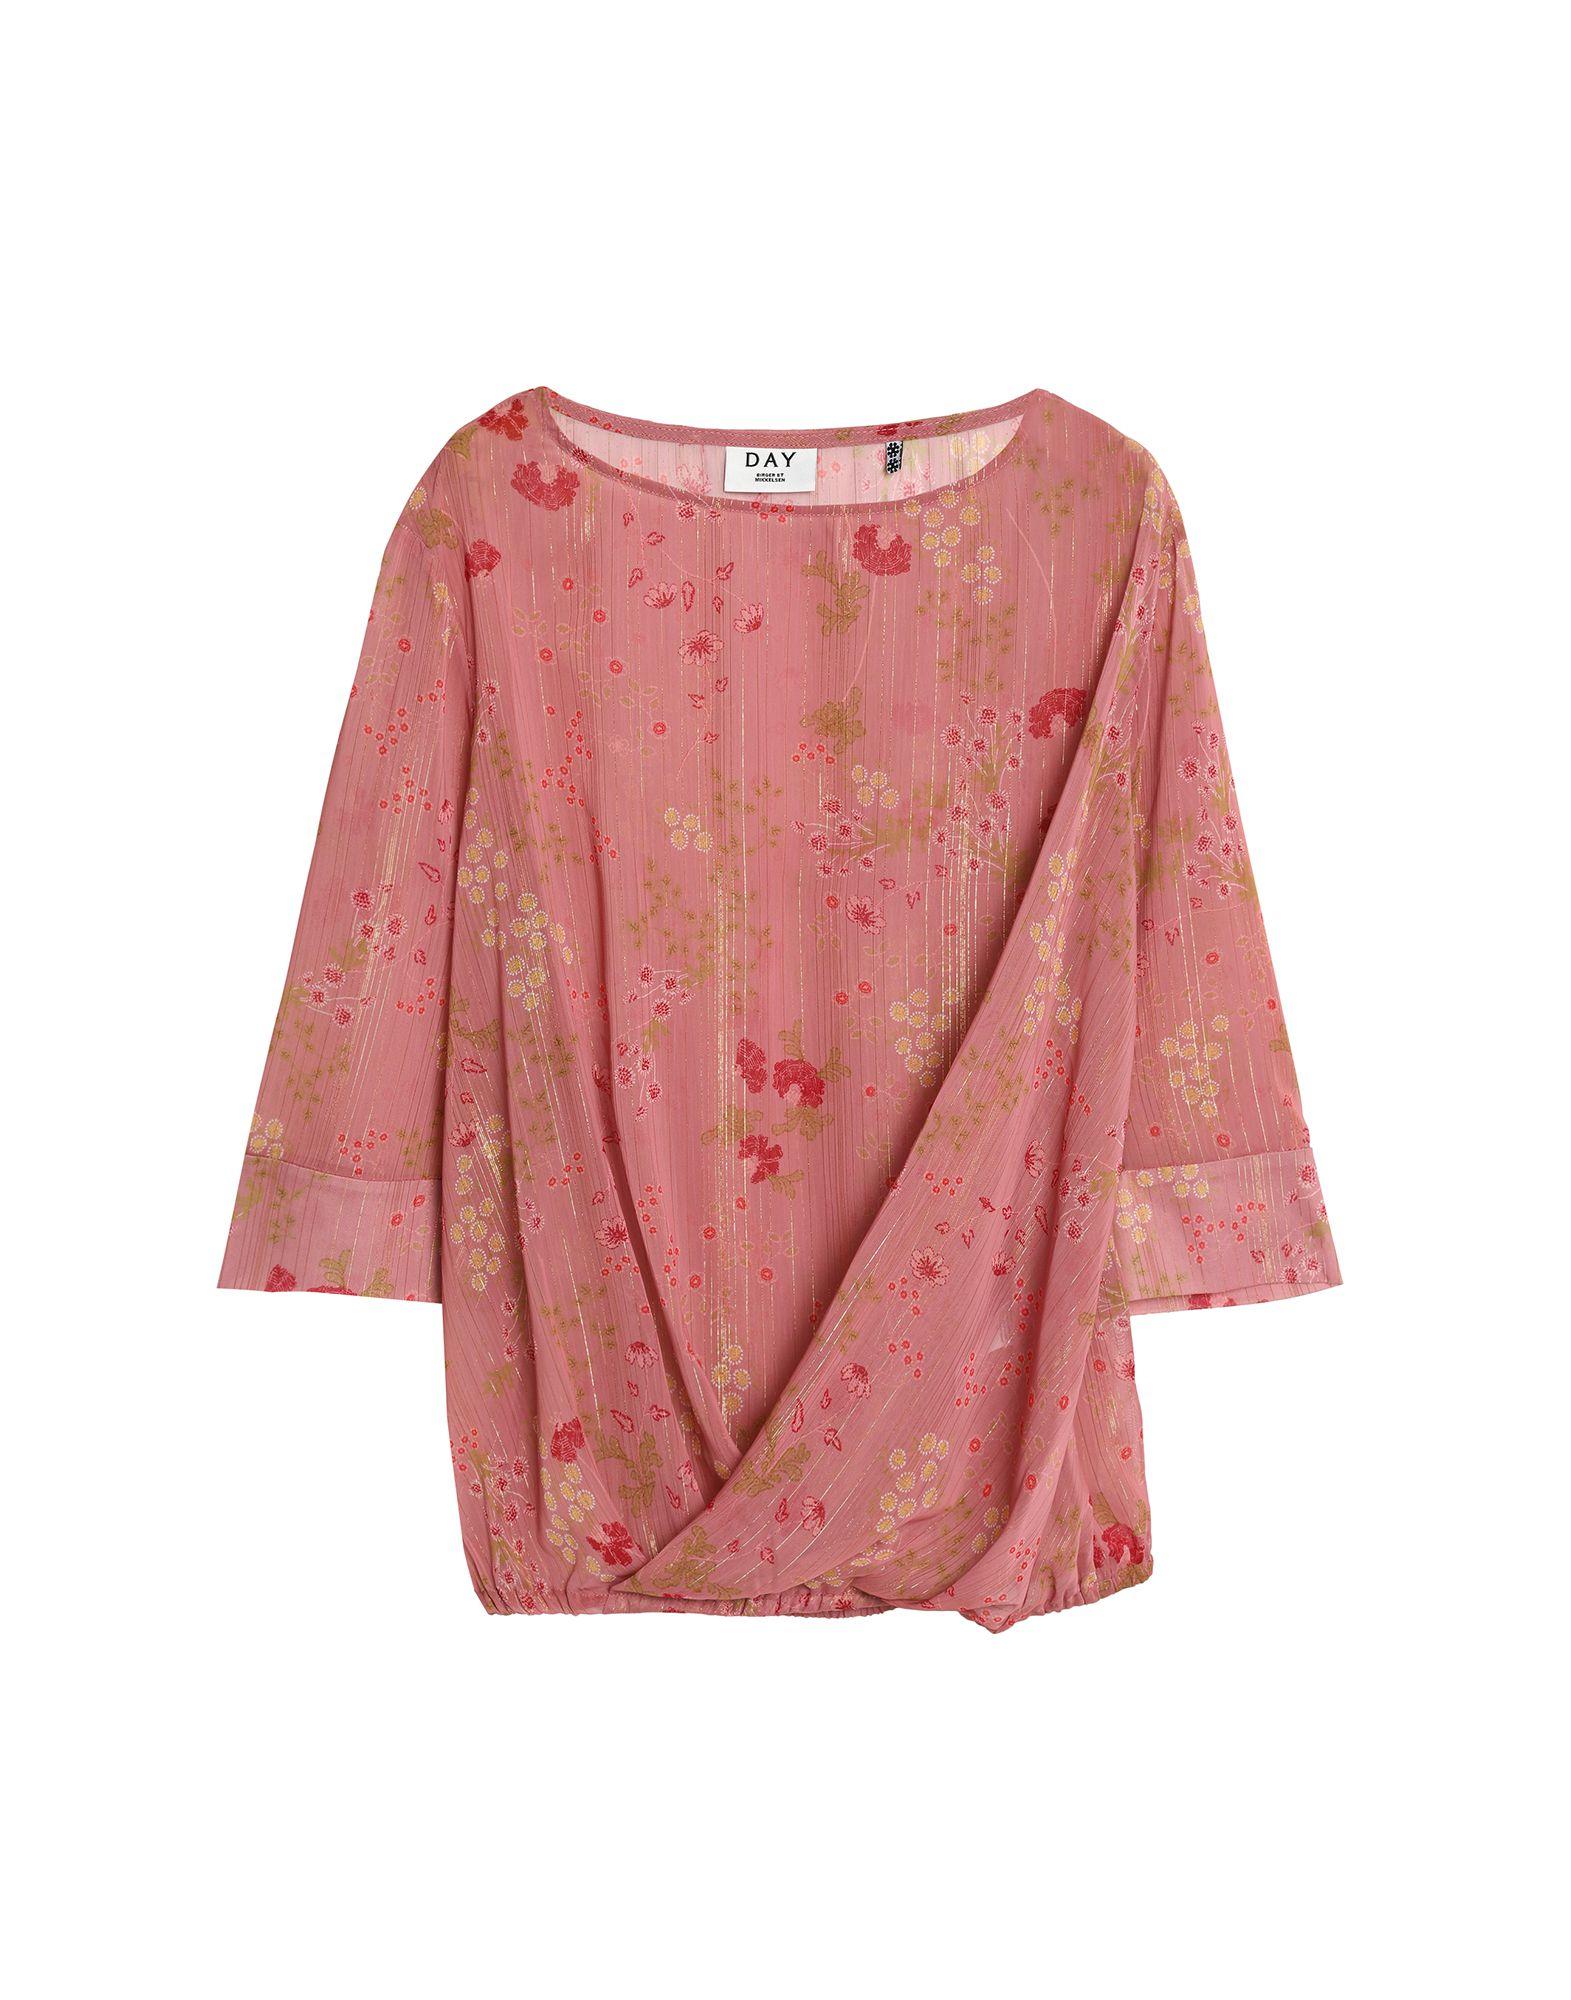 DAY BIRGER ET MIKKELSEN Блузка day birger et mikkelsen блузка